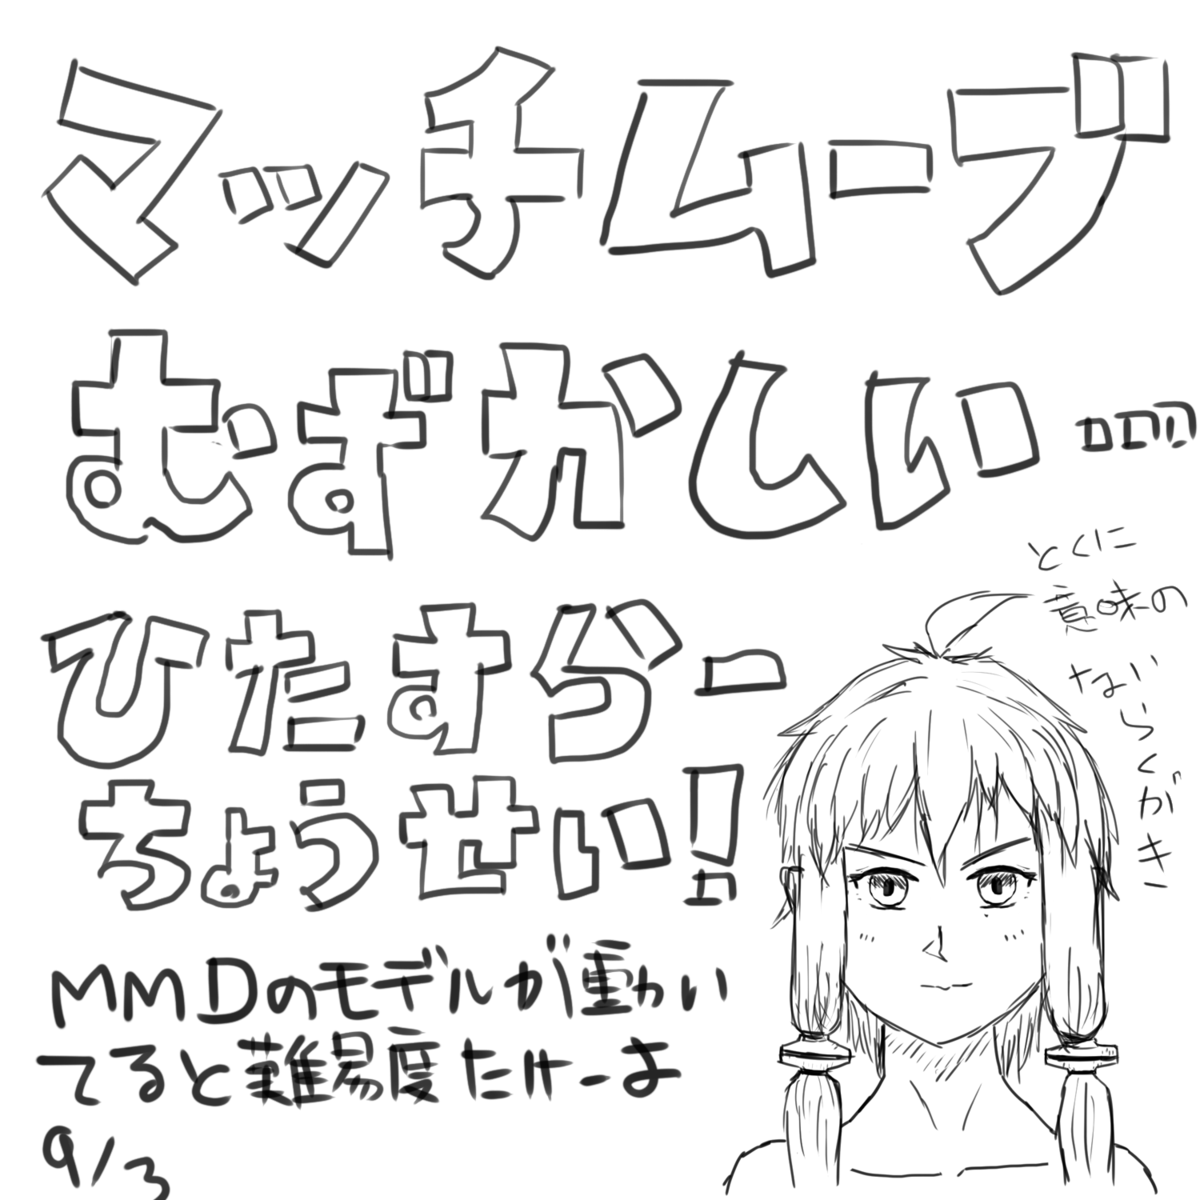 f:id:zomuzomu:20200903120131p:plain